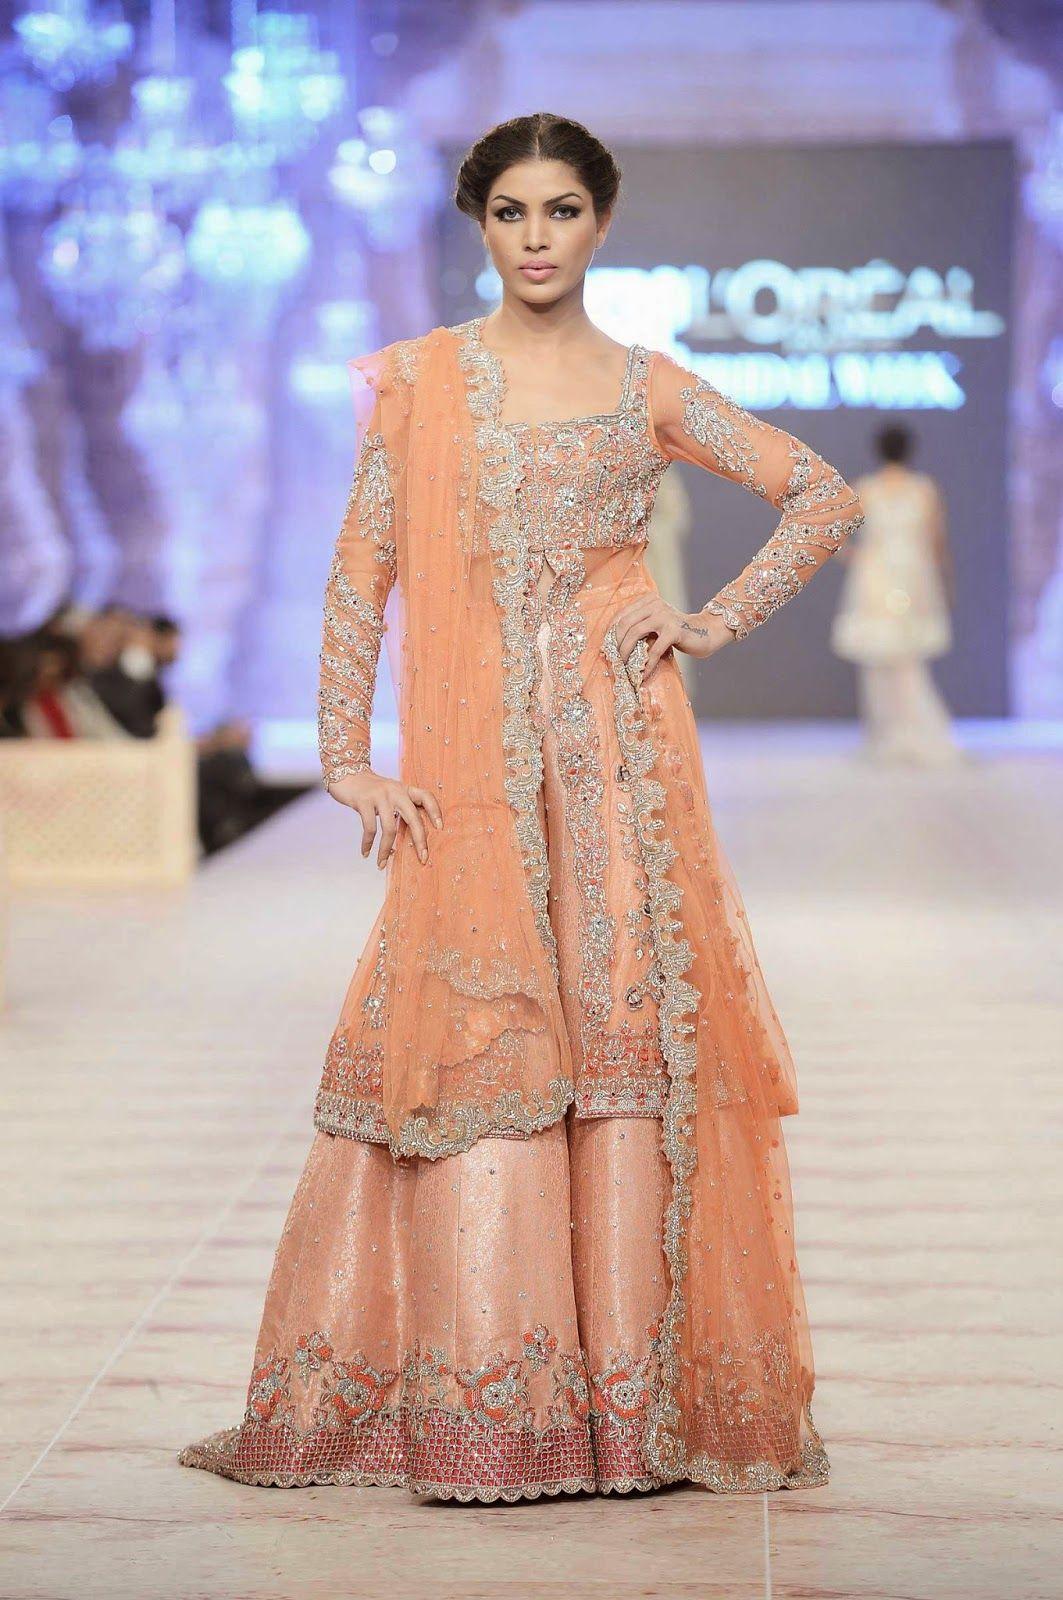 Ammara Khan at PLBW 2014 Pakistan Fashion Week